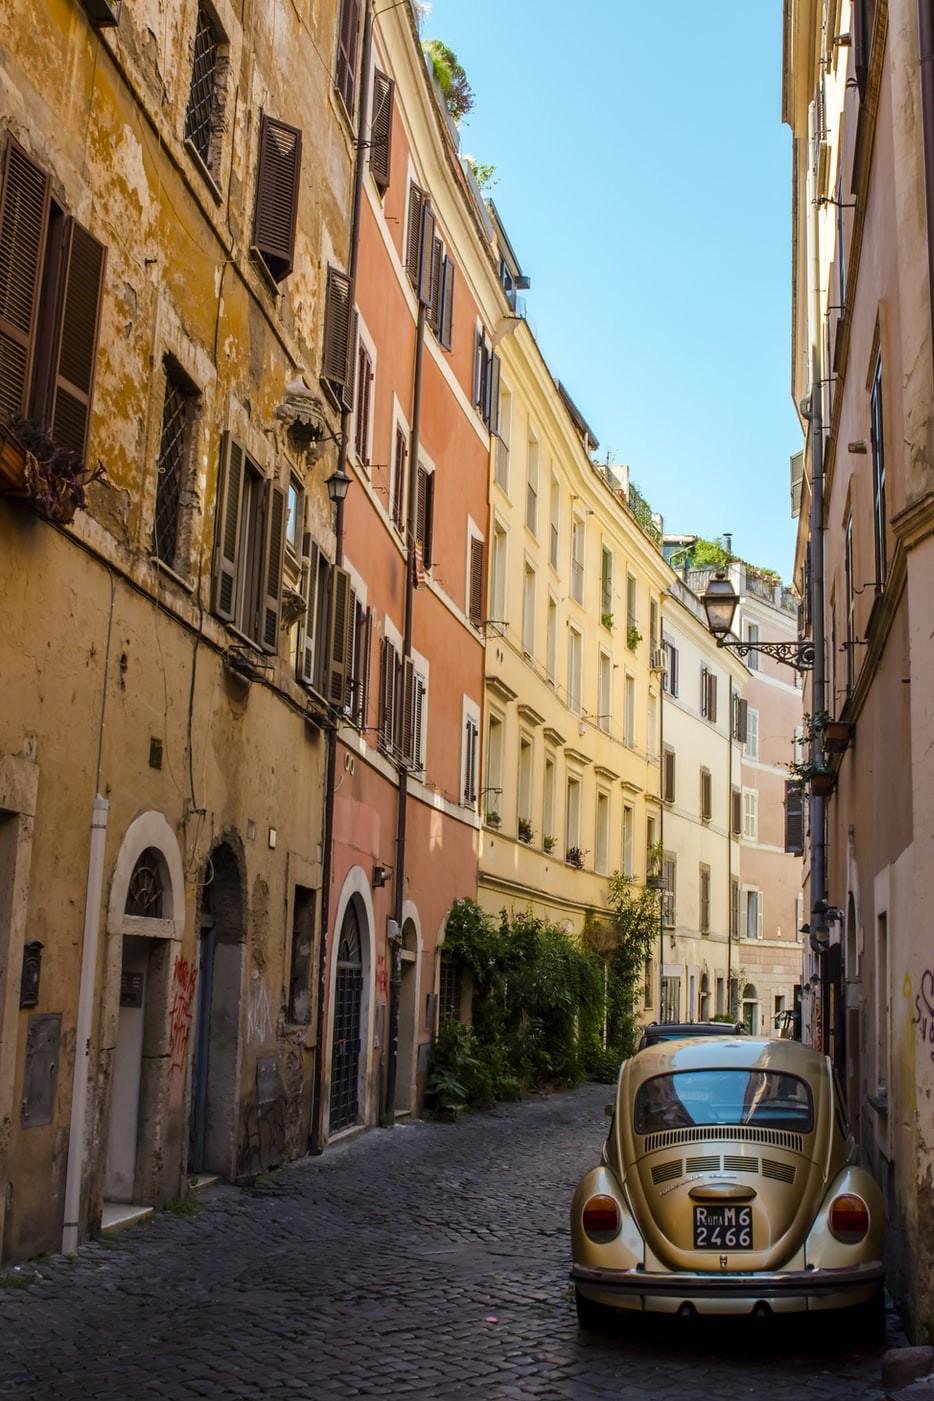 A beautiful, old, Trastevere Street